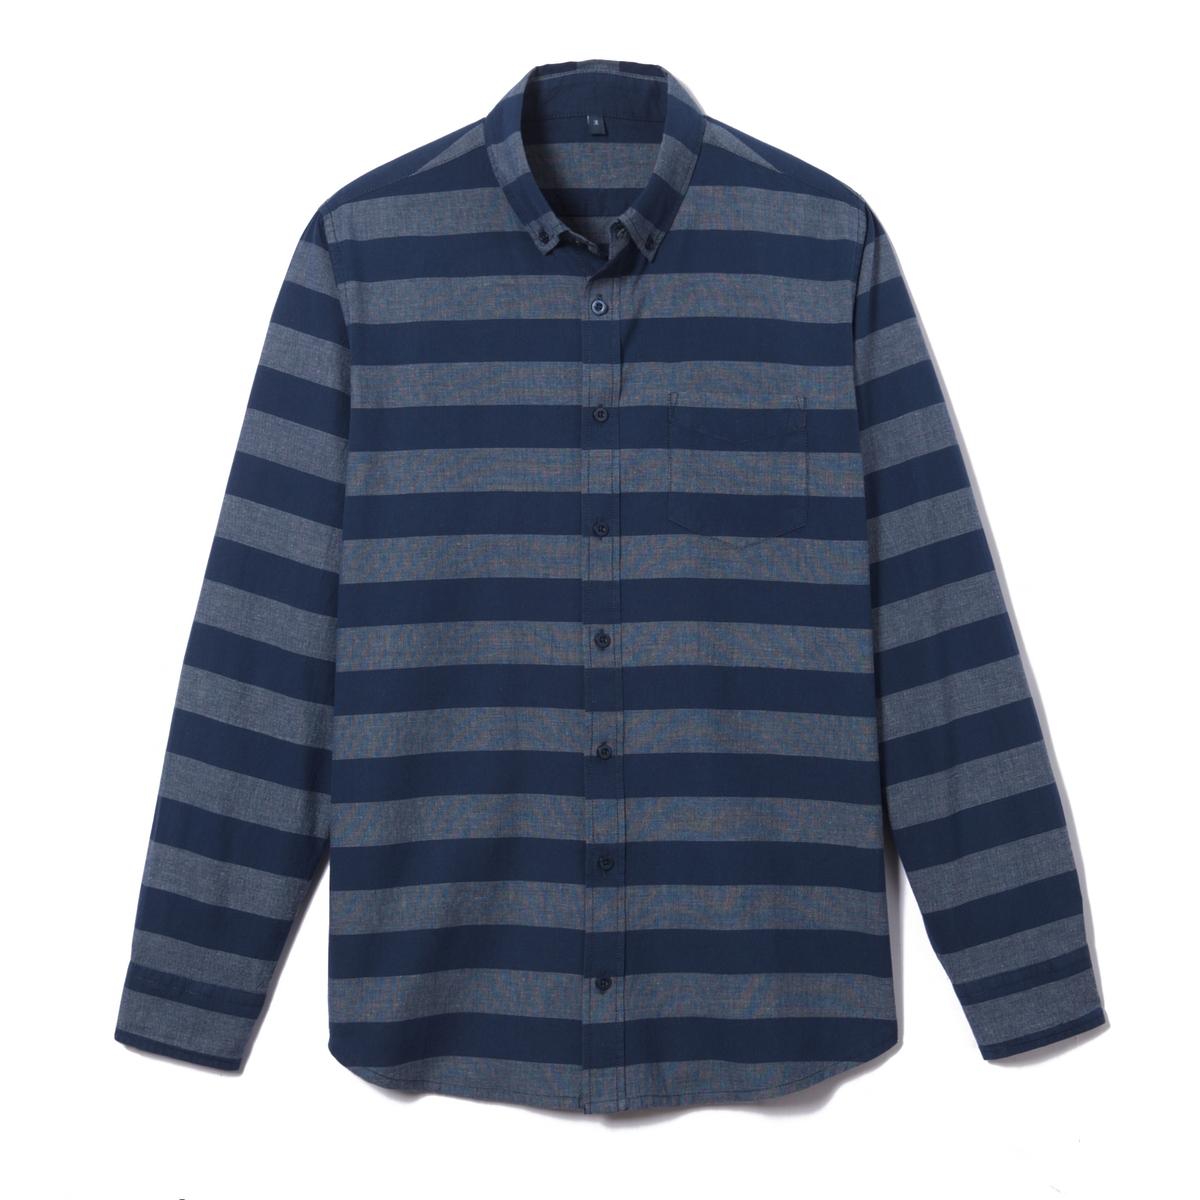 Camisa regular a rayas 100% algodón chambray